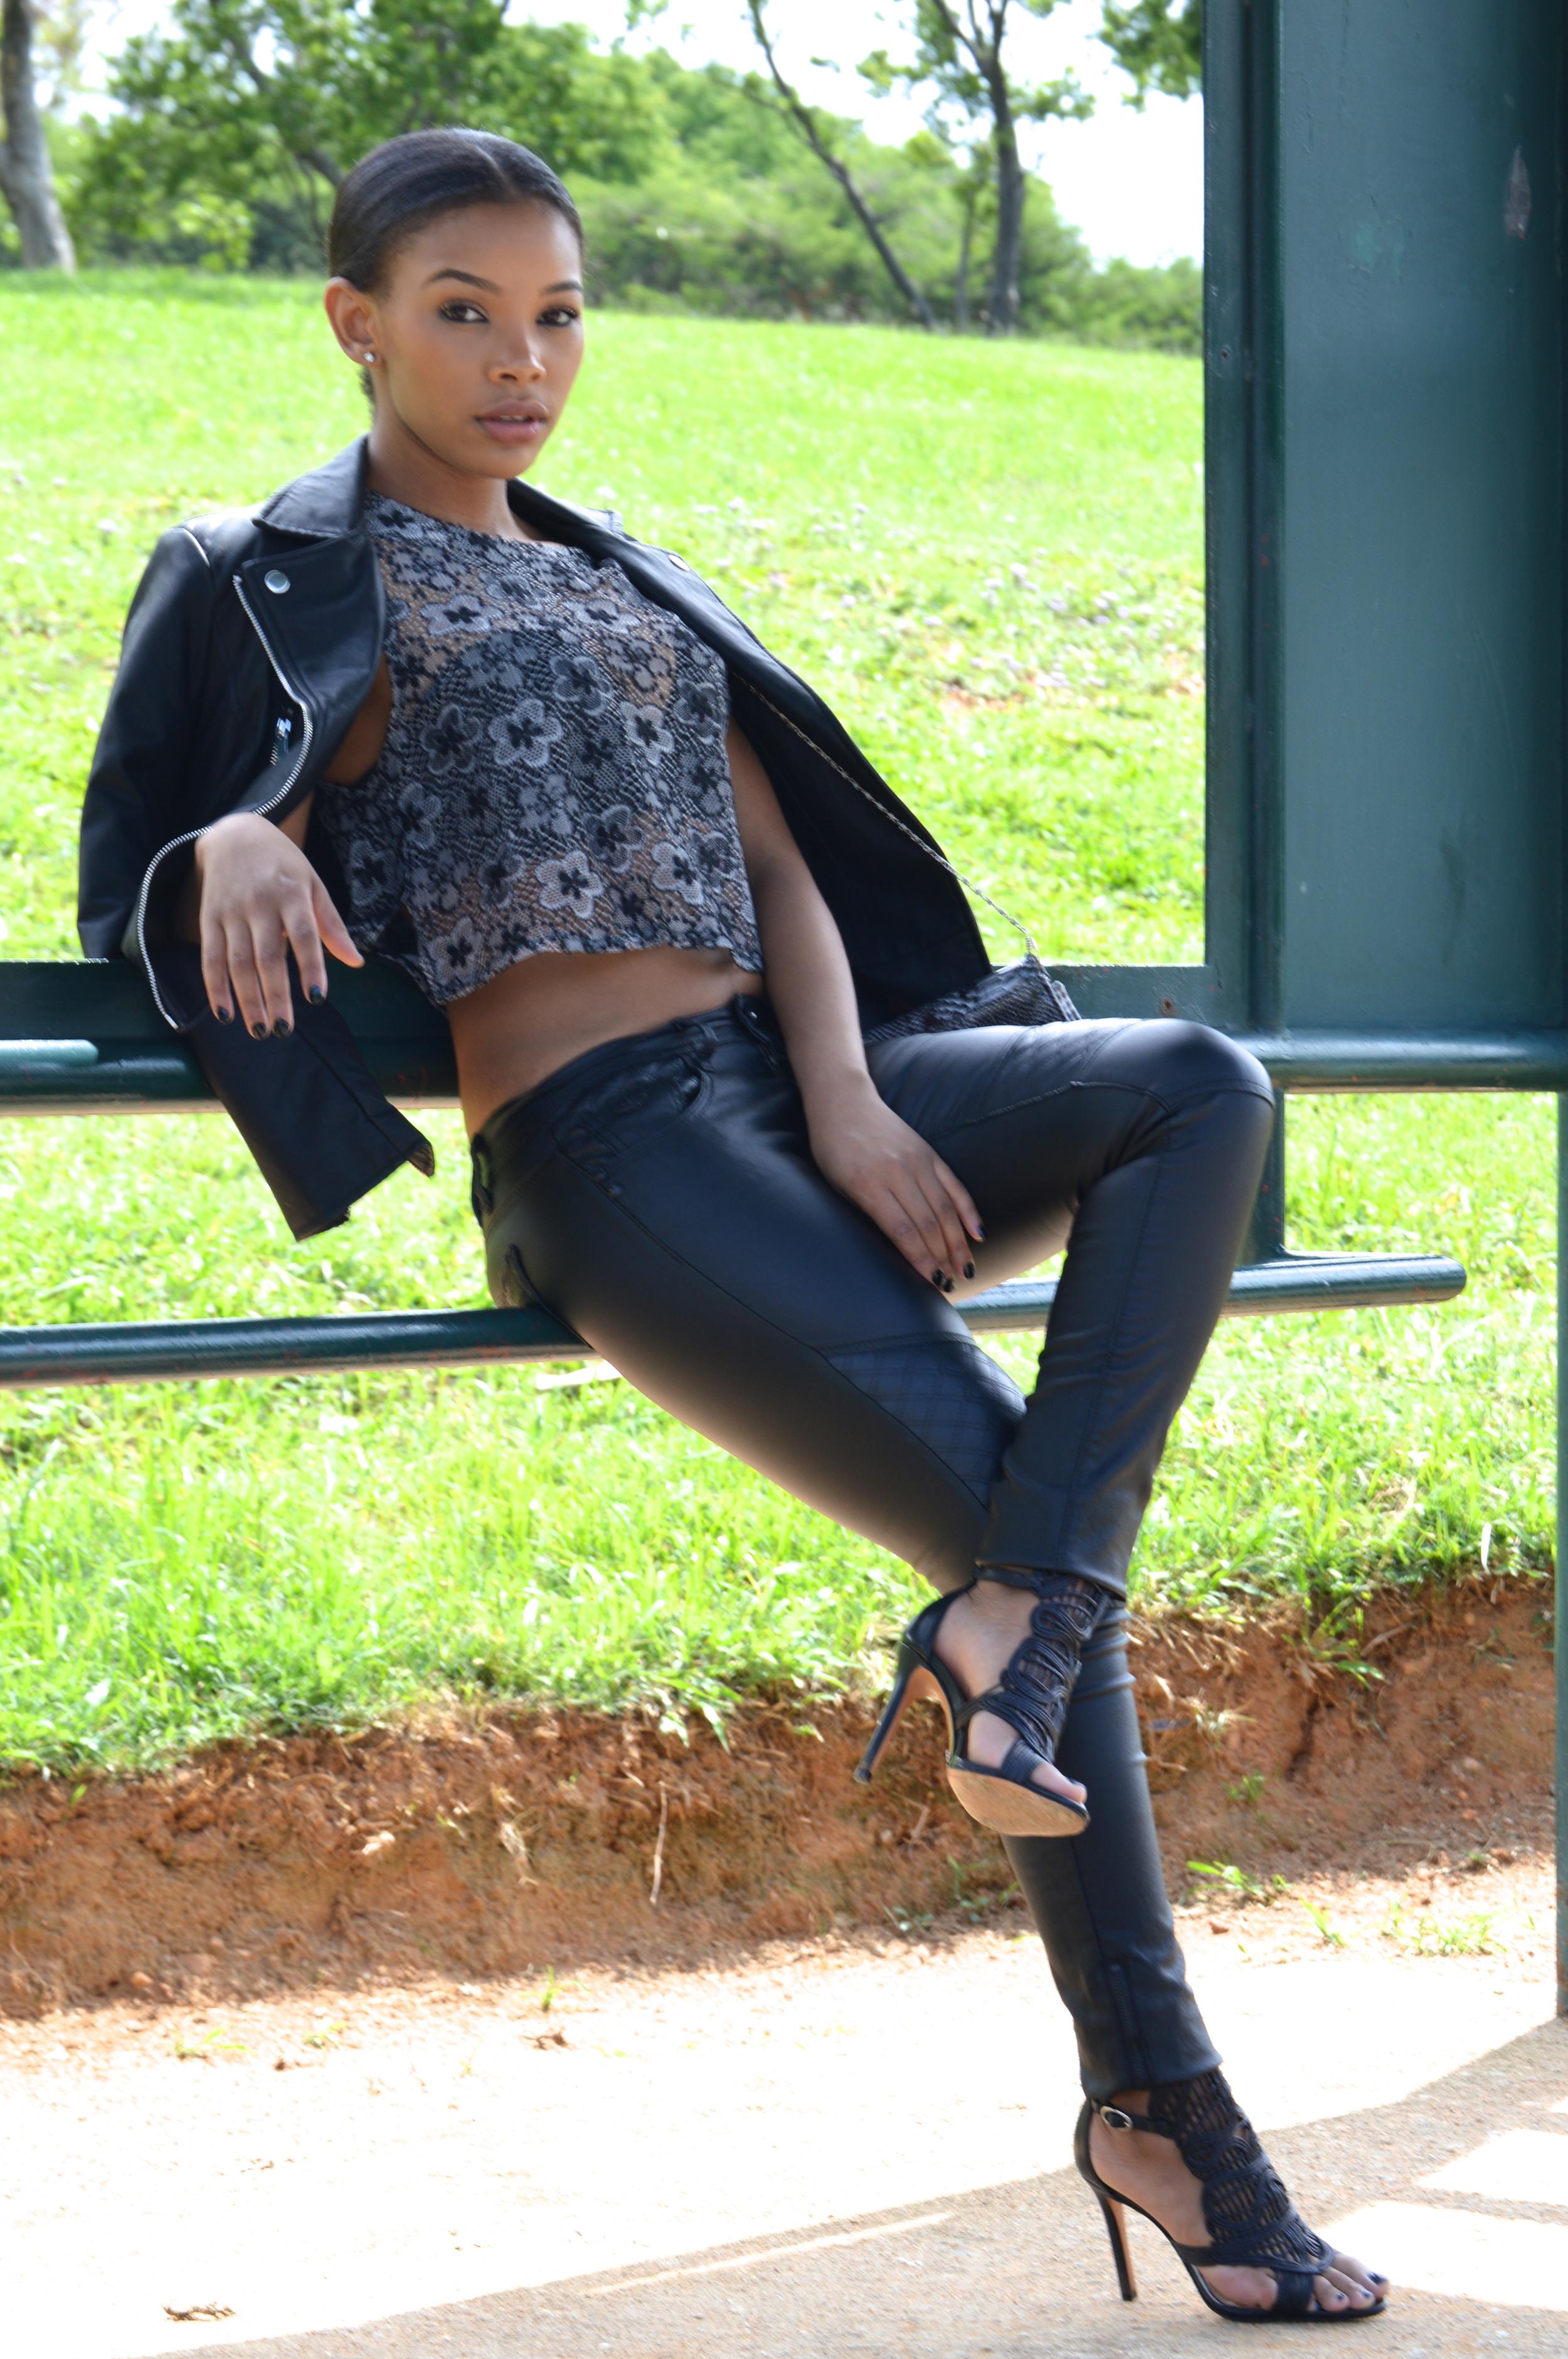 Kaylista_leather1